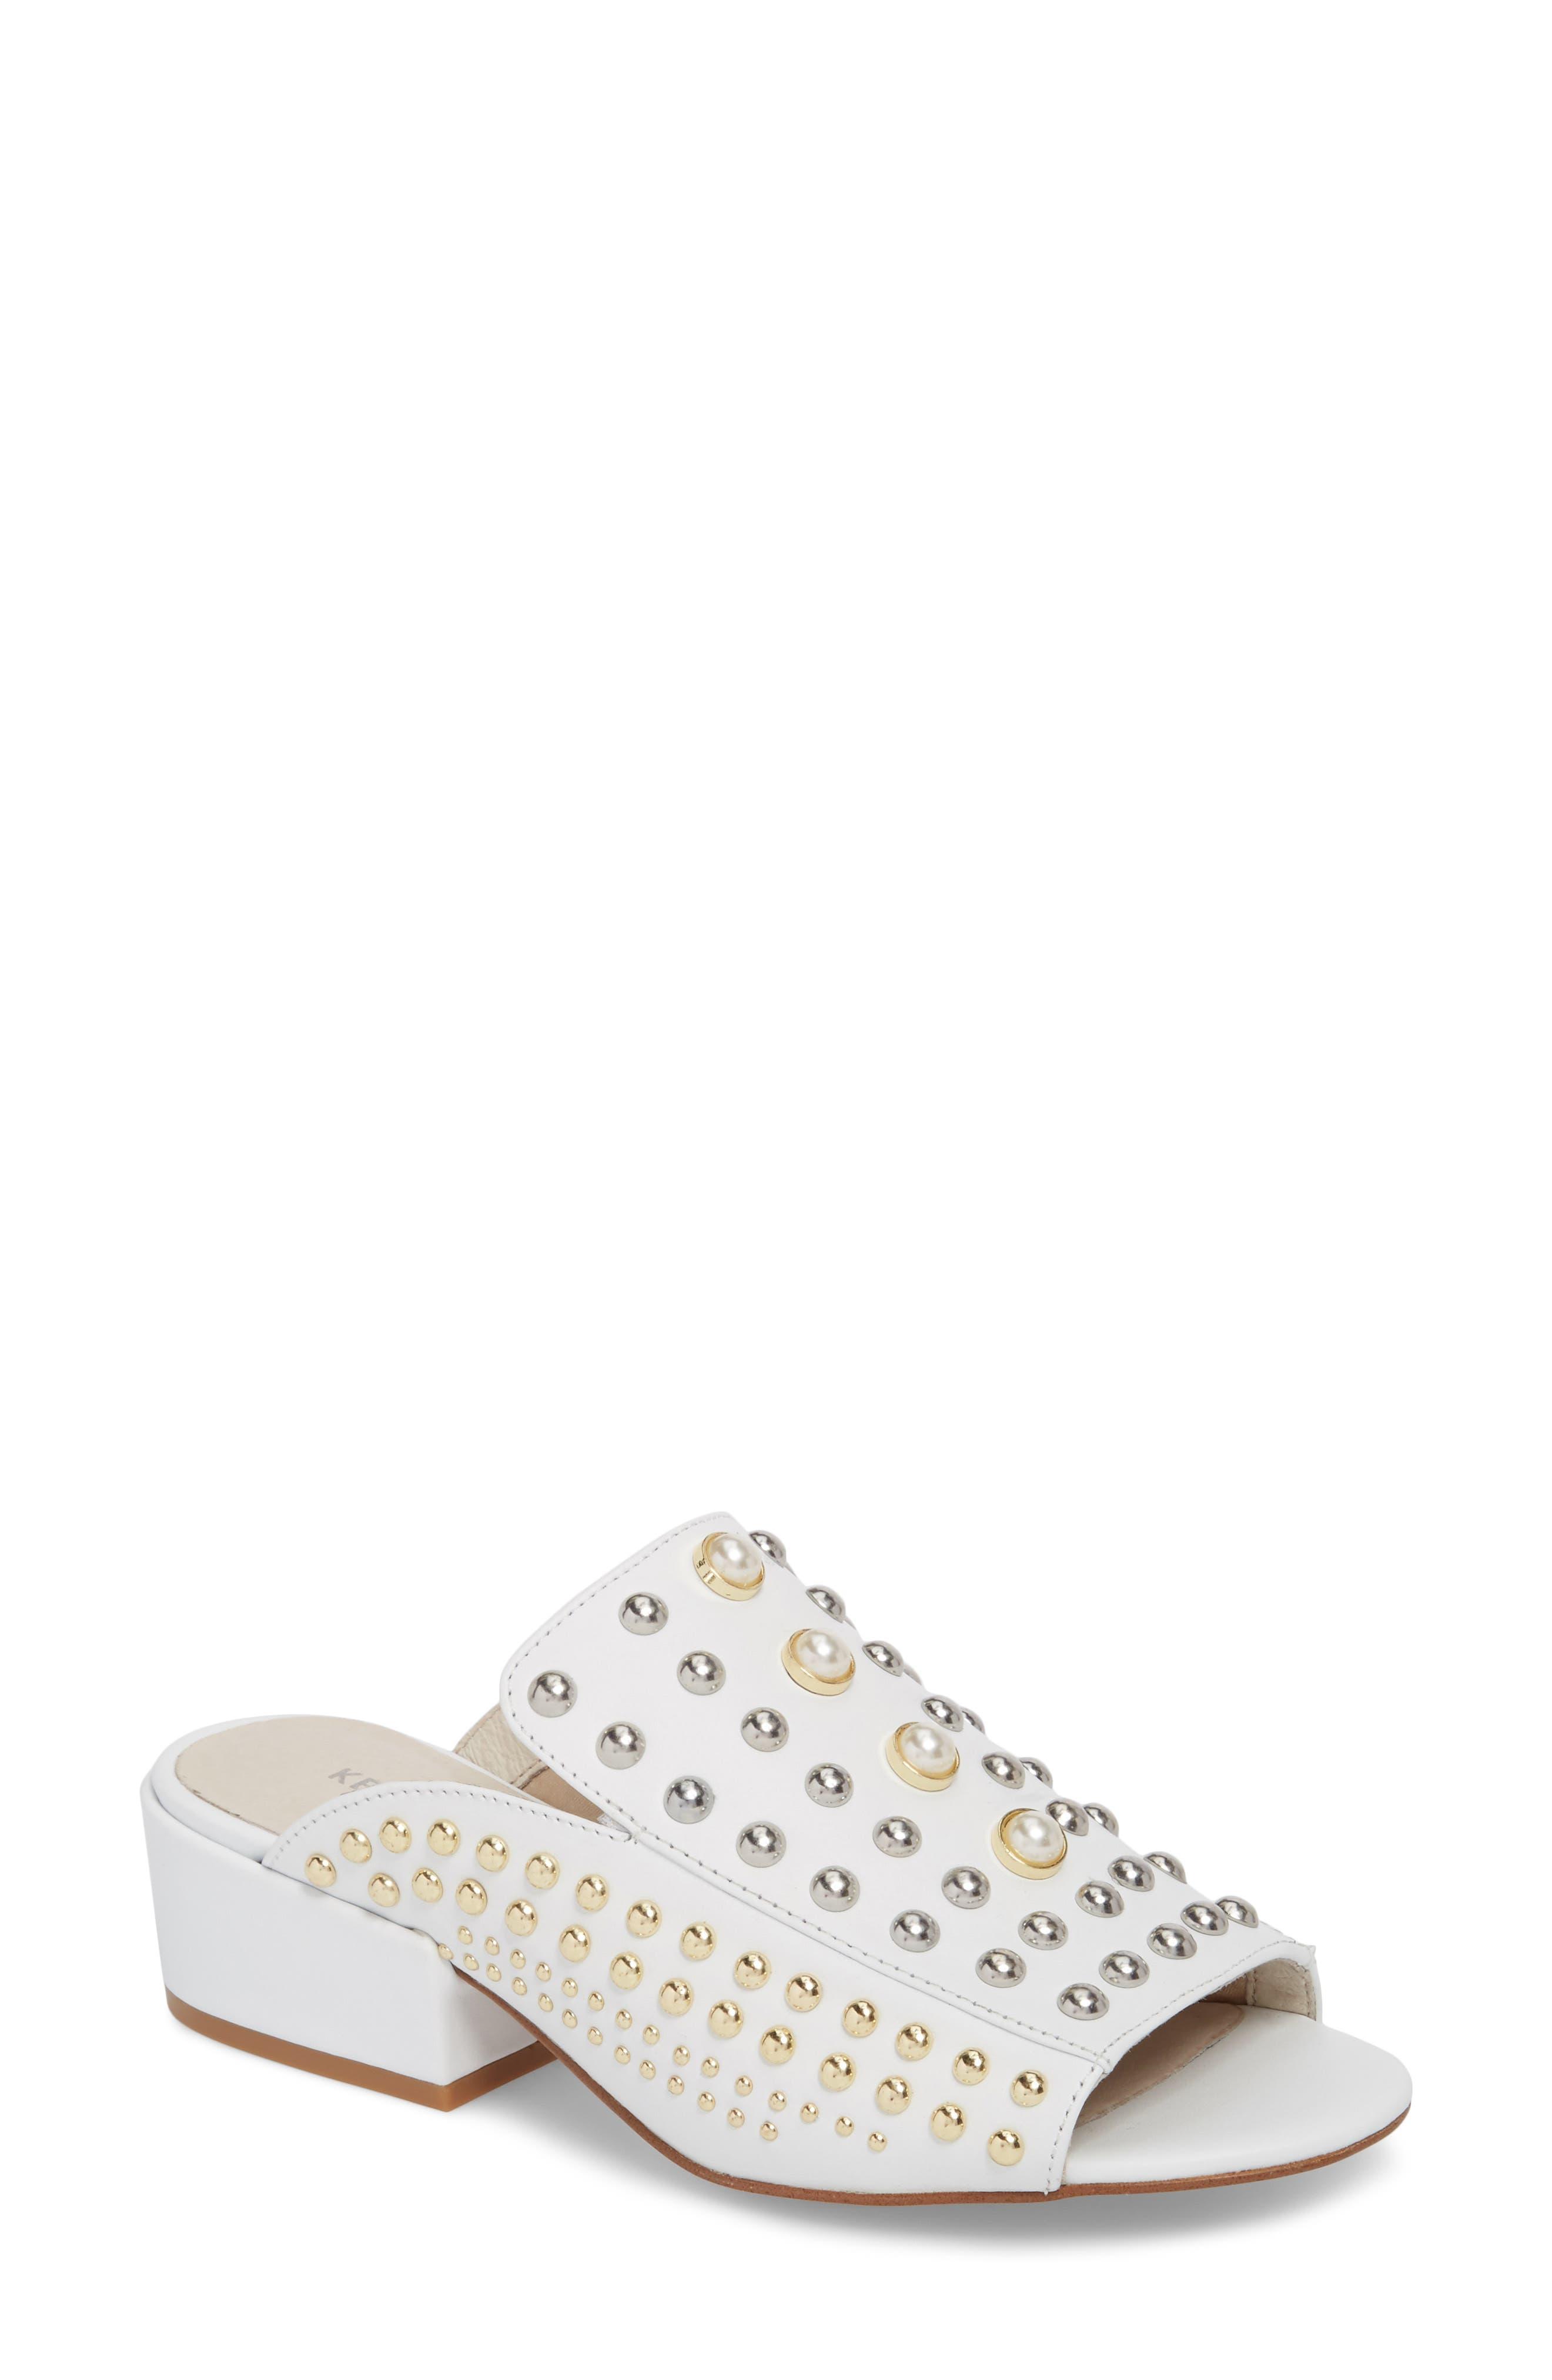 Farley Studded Slide Sandal,                         Main,                         color, White Leather